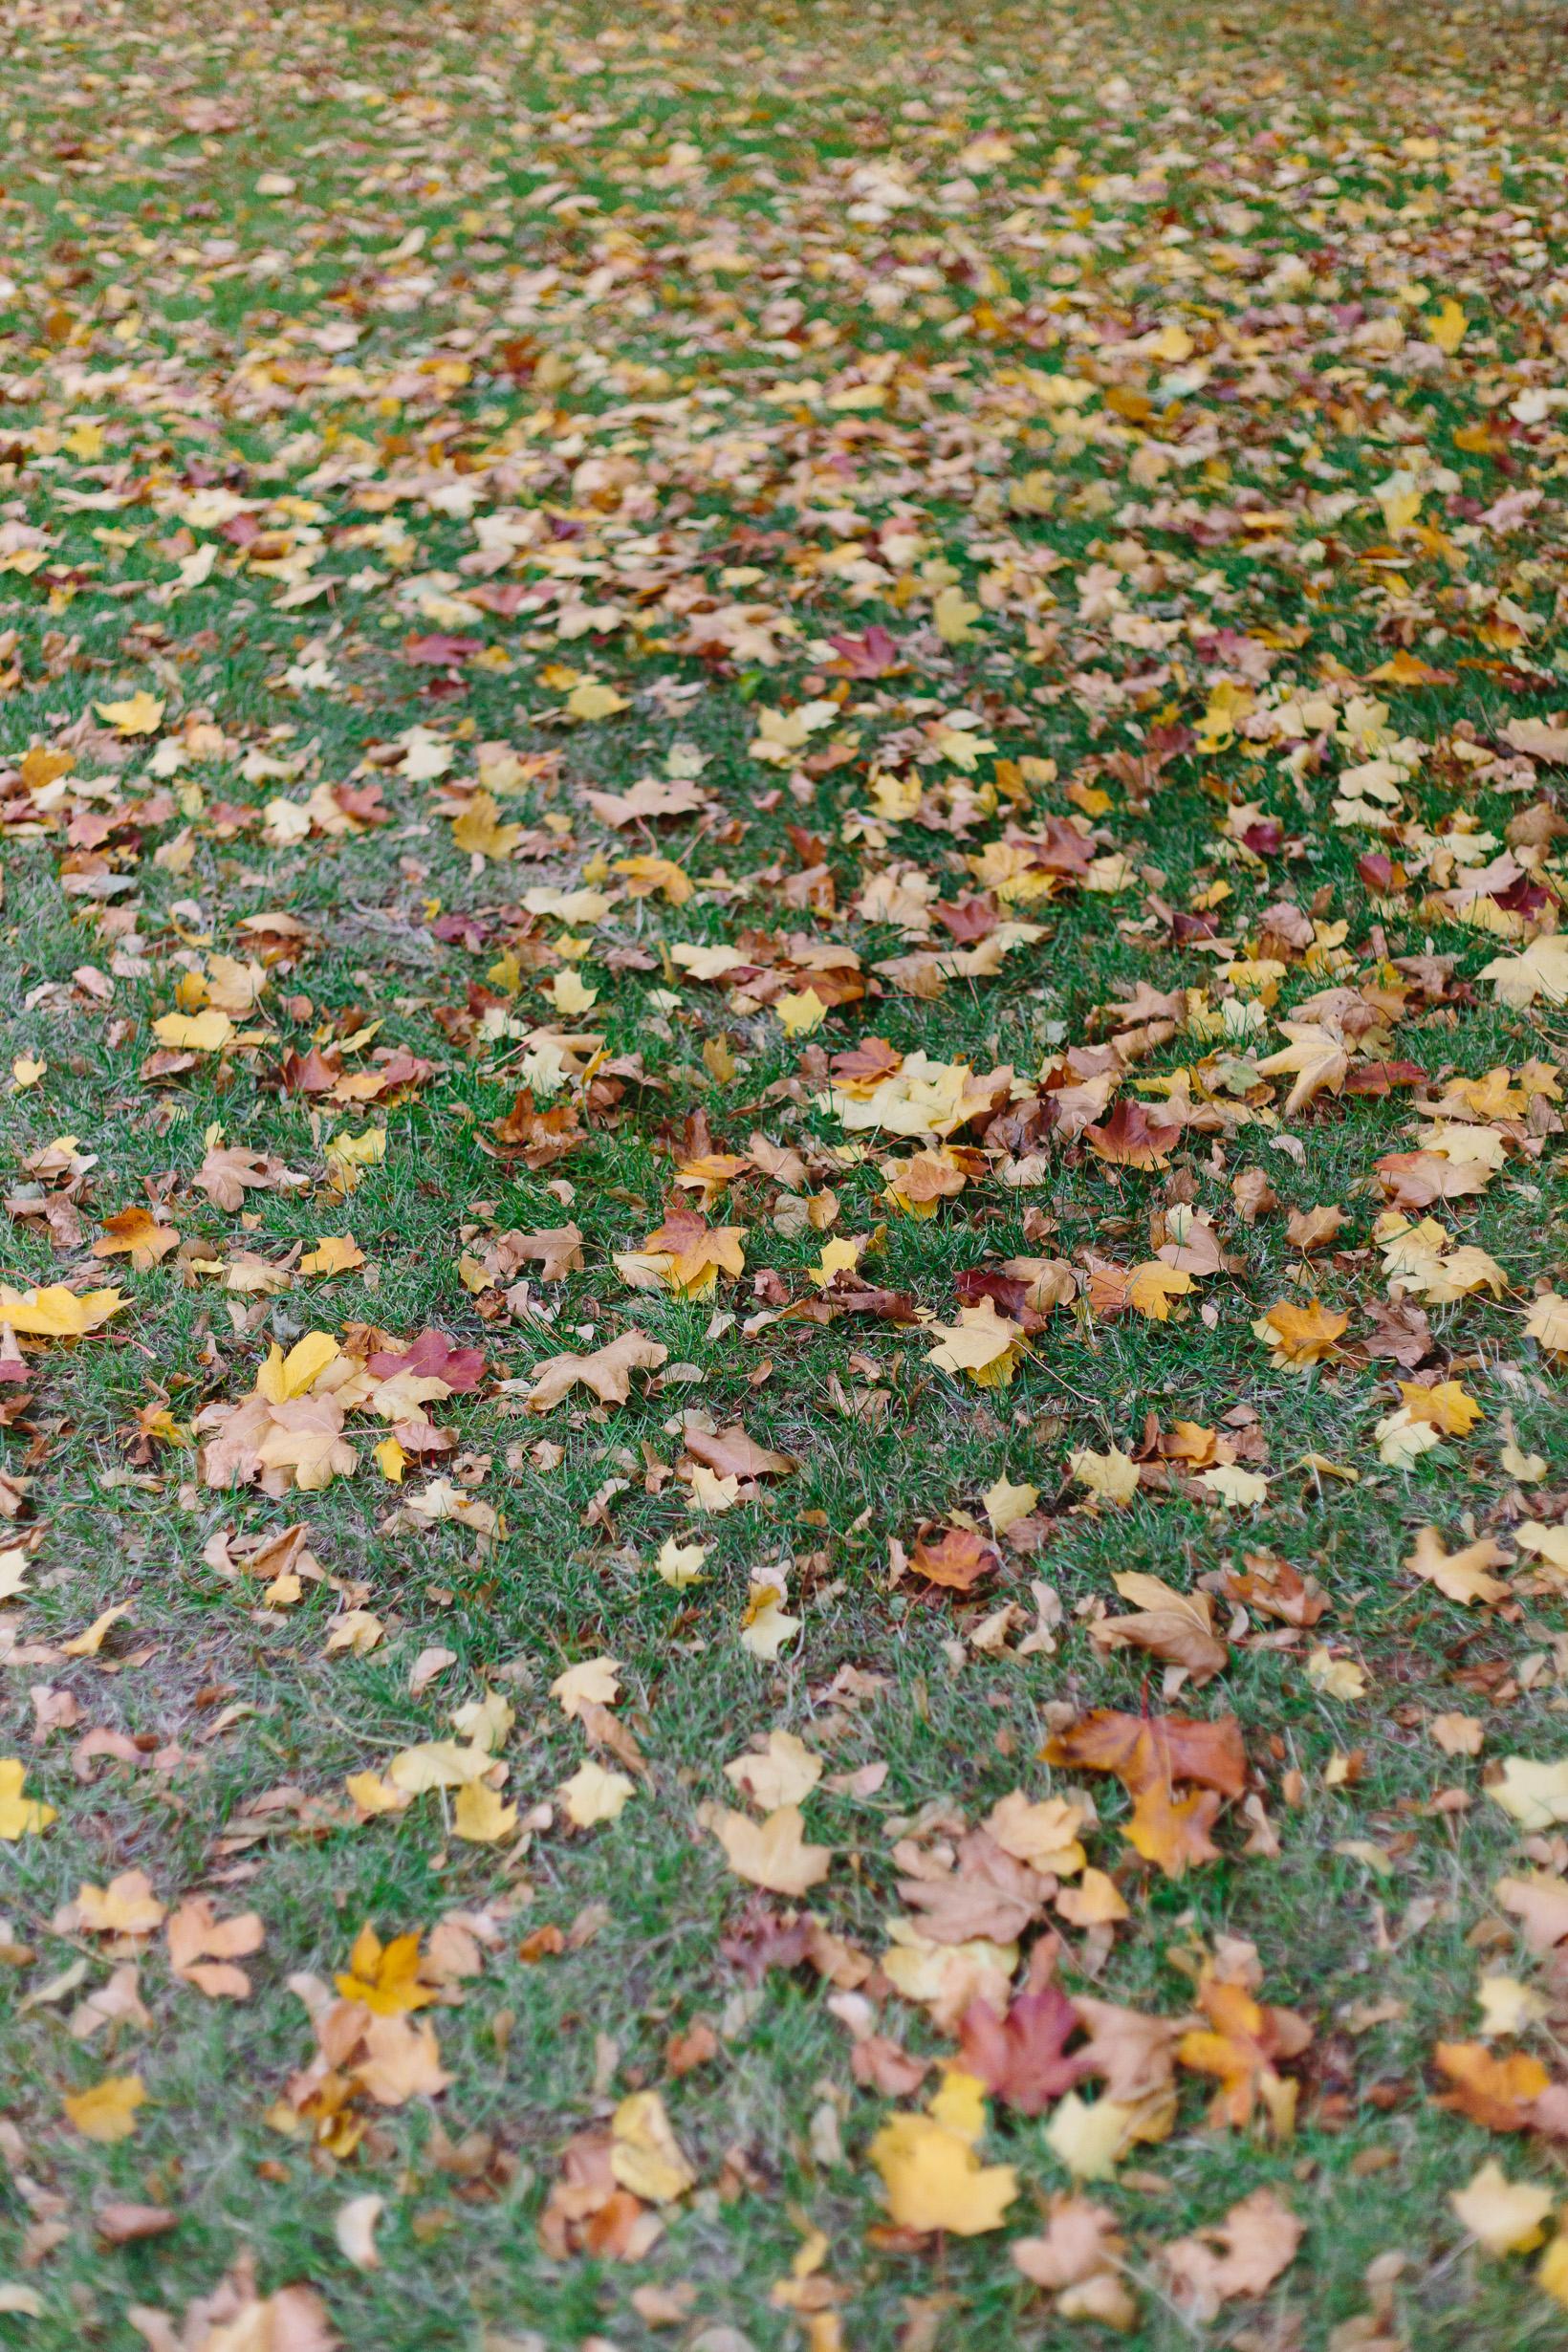 autumn-in-hyde-park-london-4112